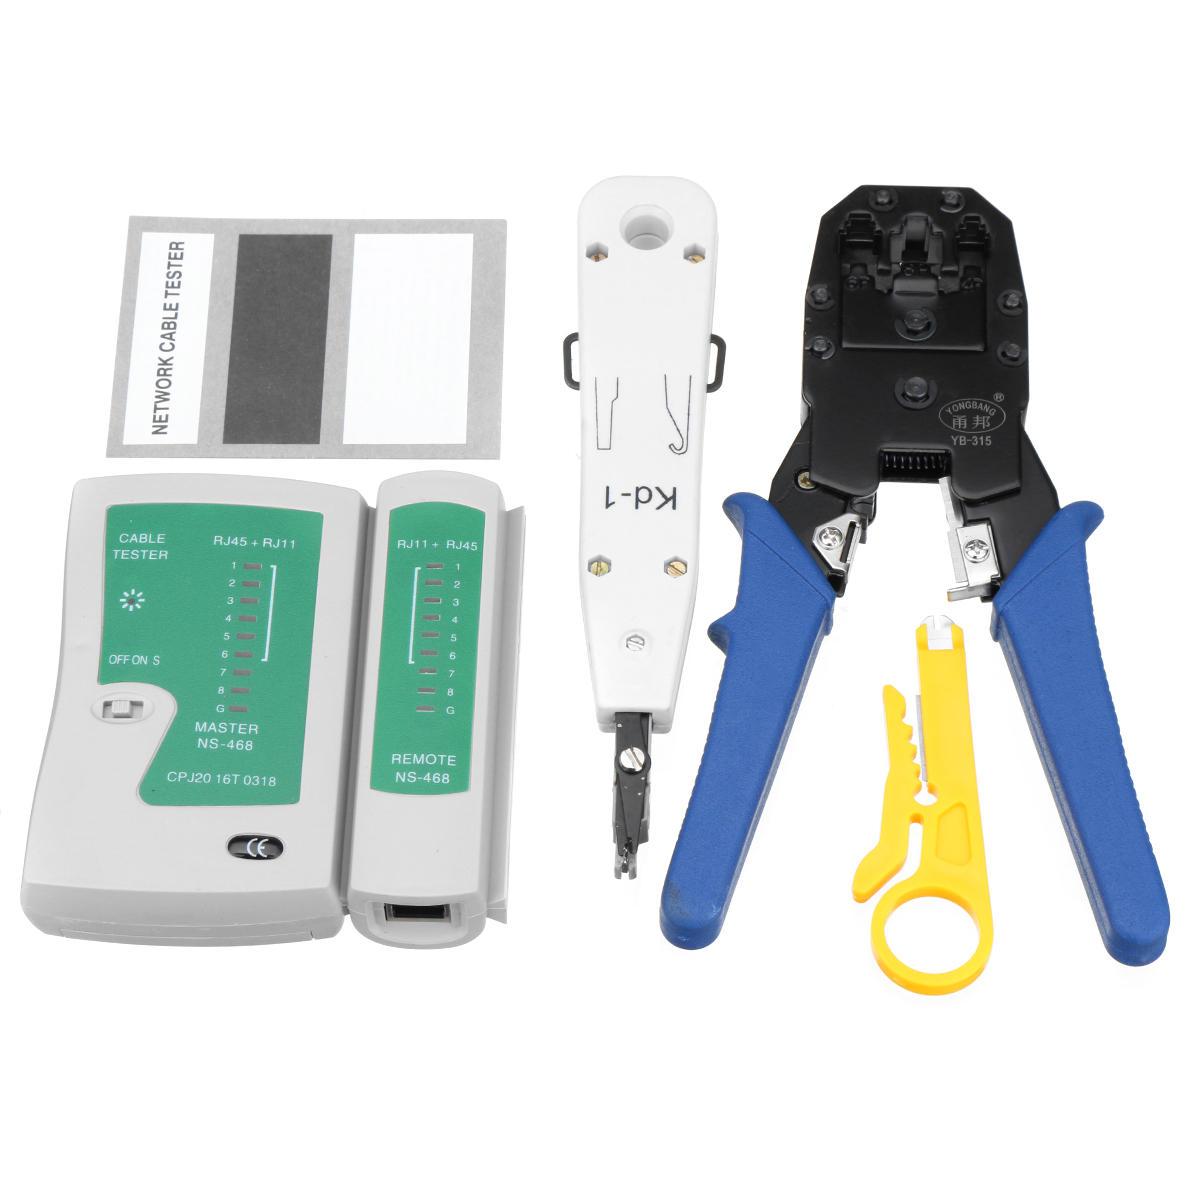 Rj45 Plug Cat 6 Utp Wiring Harness Wiring Diagram Wiring